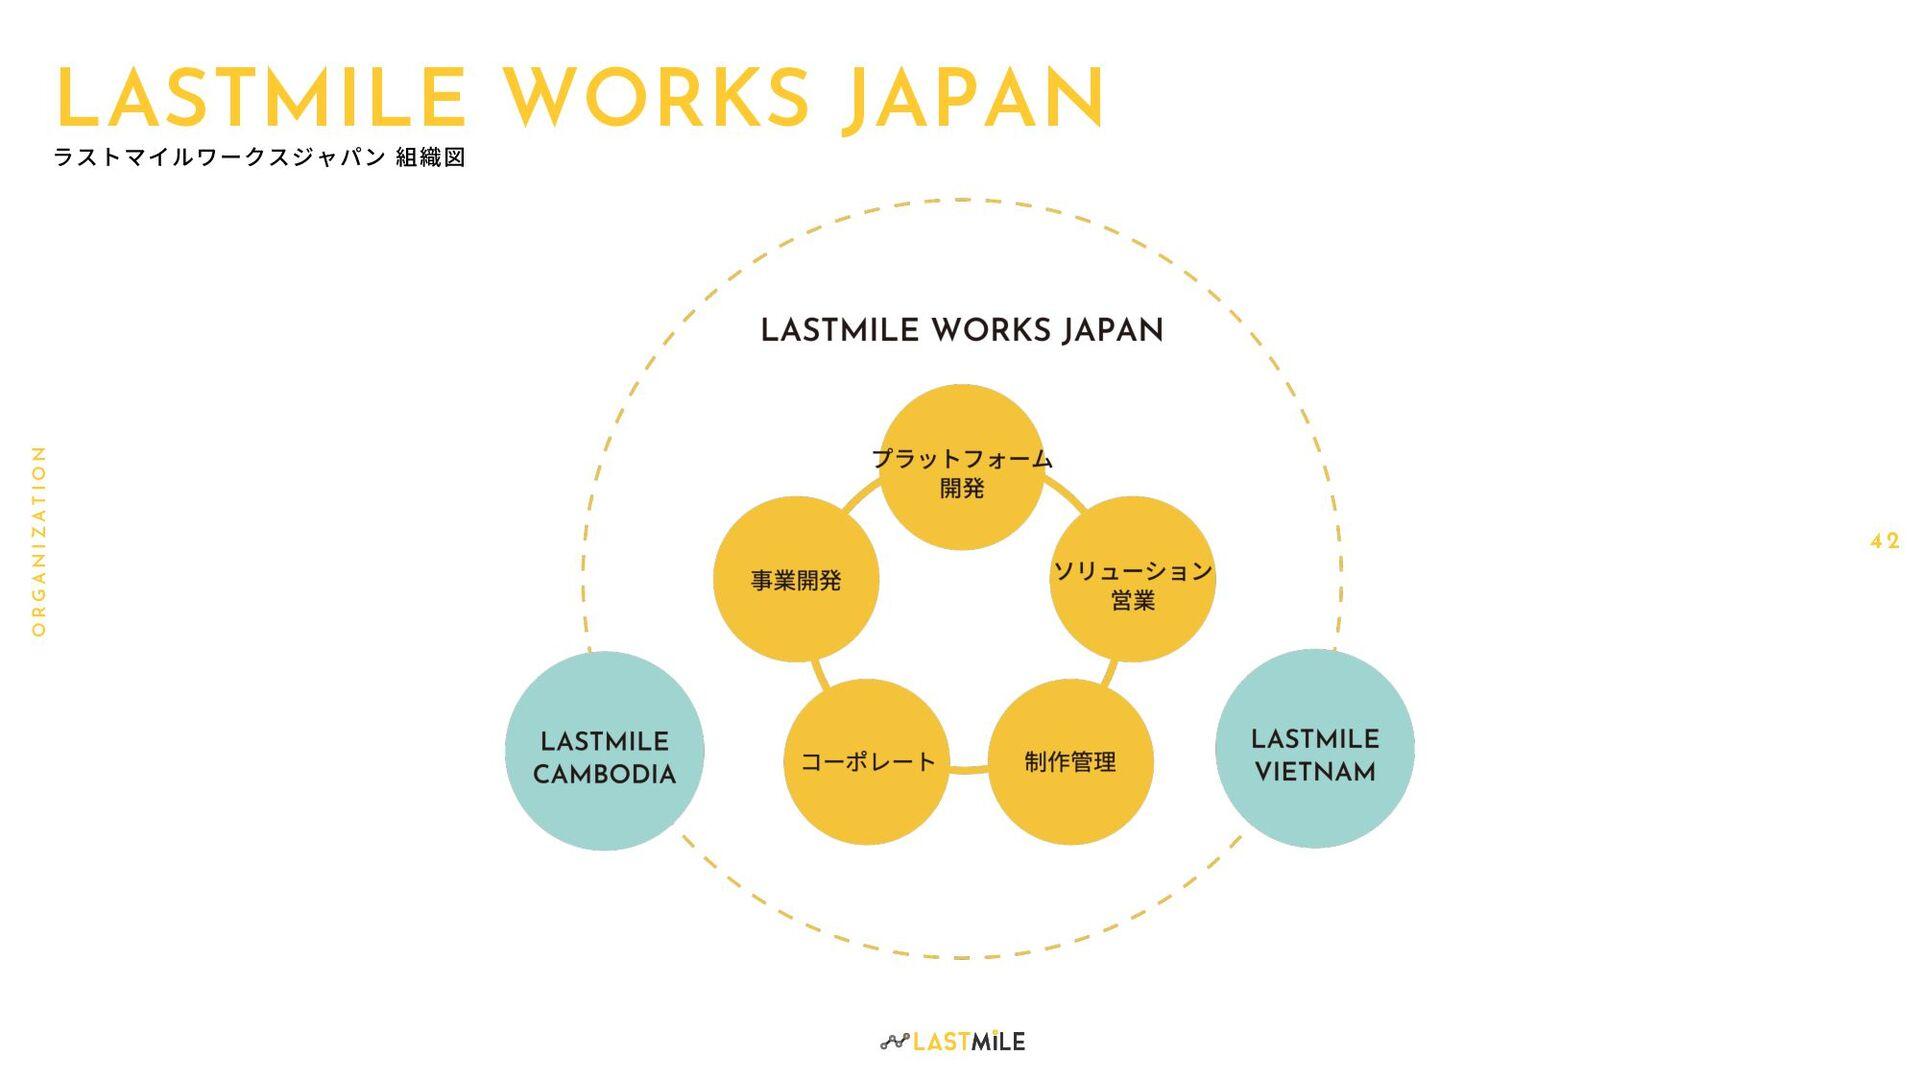 4 2 O R G A N I Z A T I O N LASTMILE WORKS JAPAN